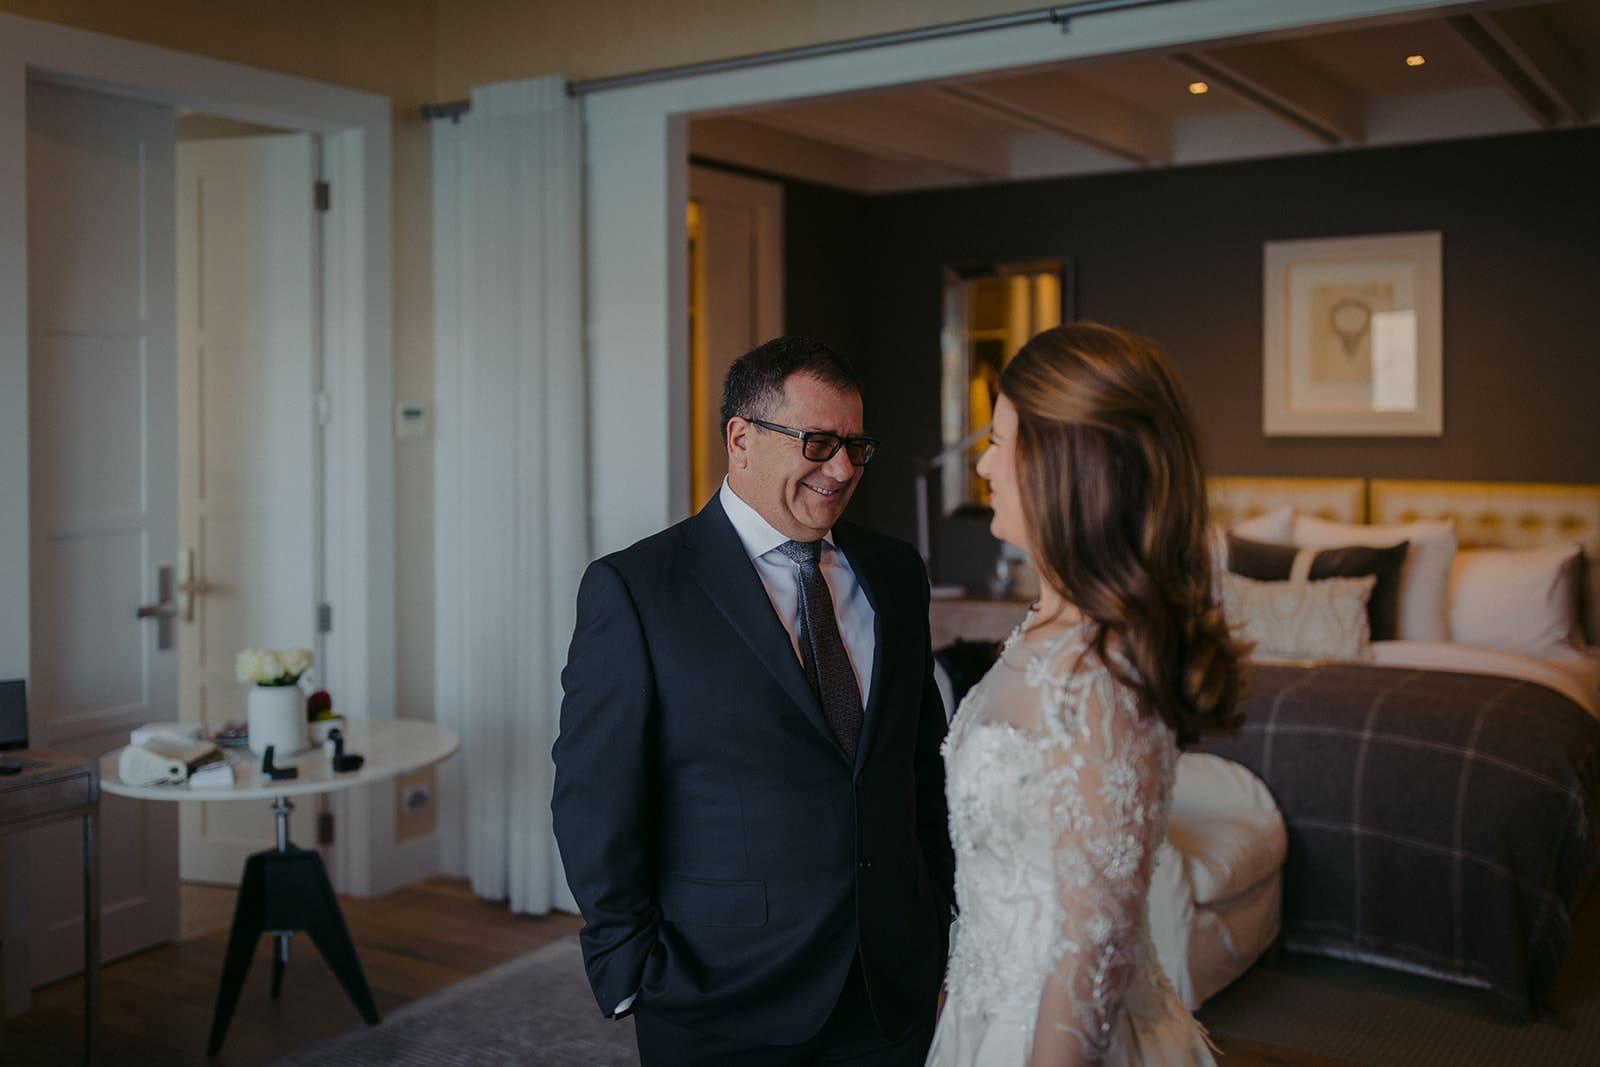 Real Weddings | Vinka Design | Real Brides Wearing Vinka Gowns | Sara and Ben -Sara and family